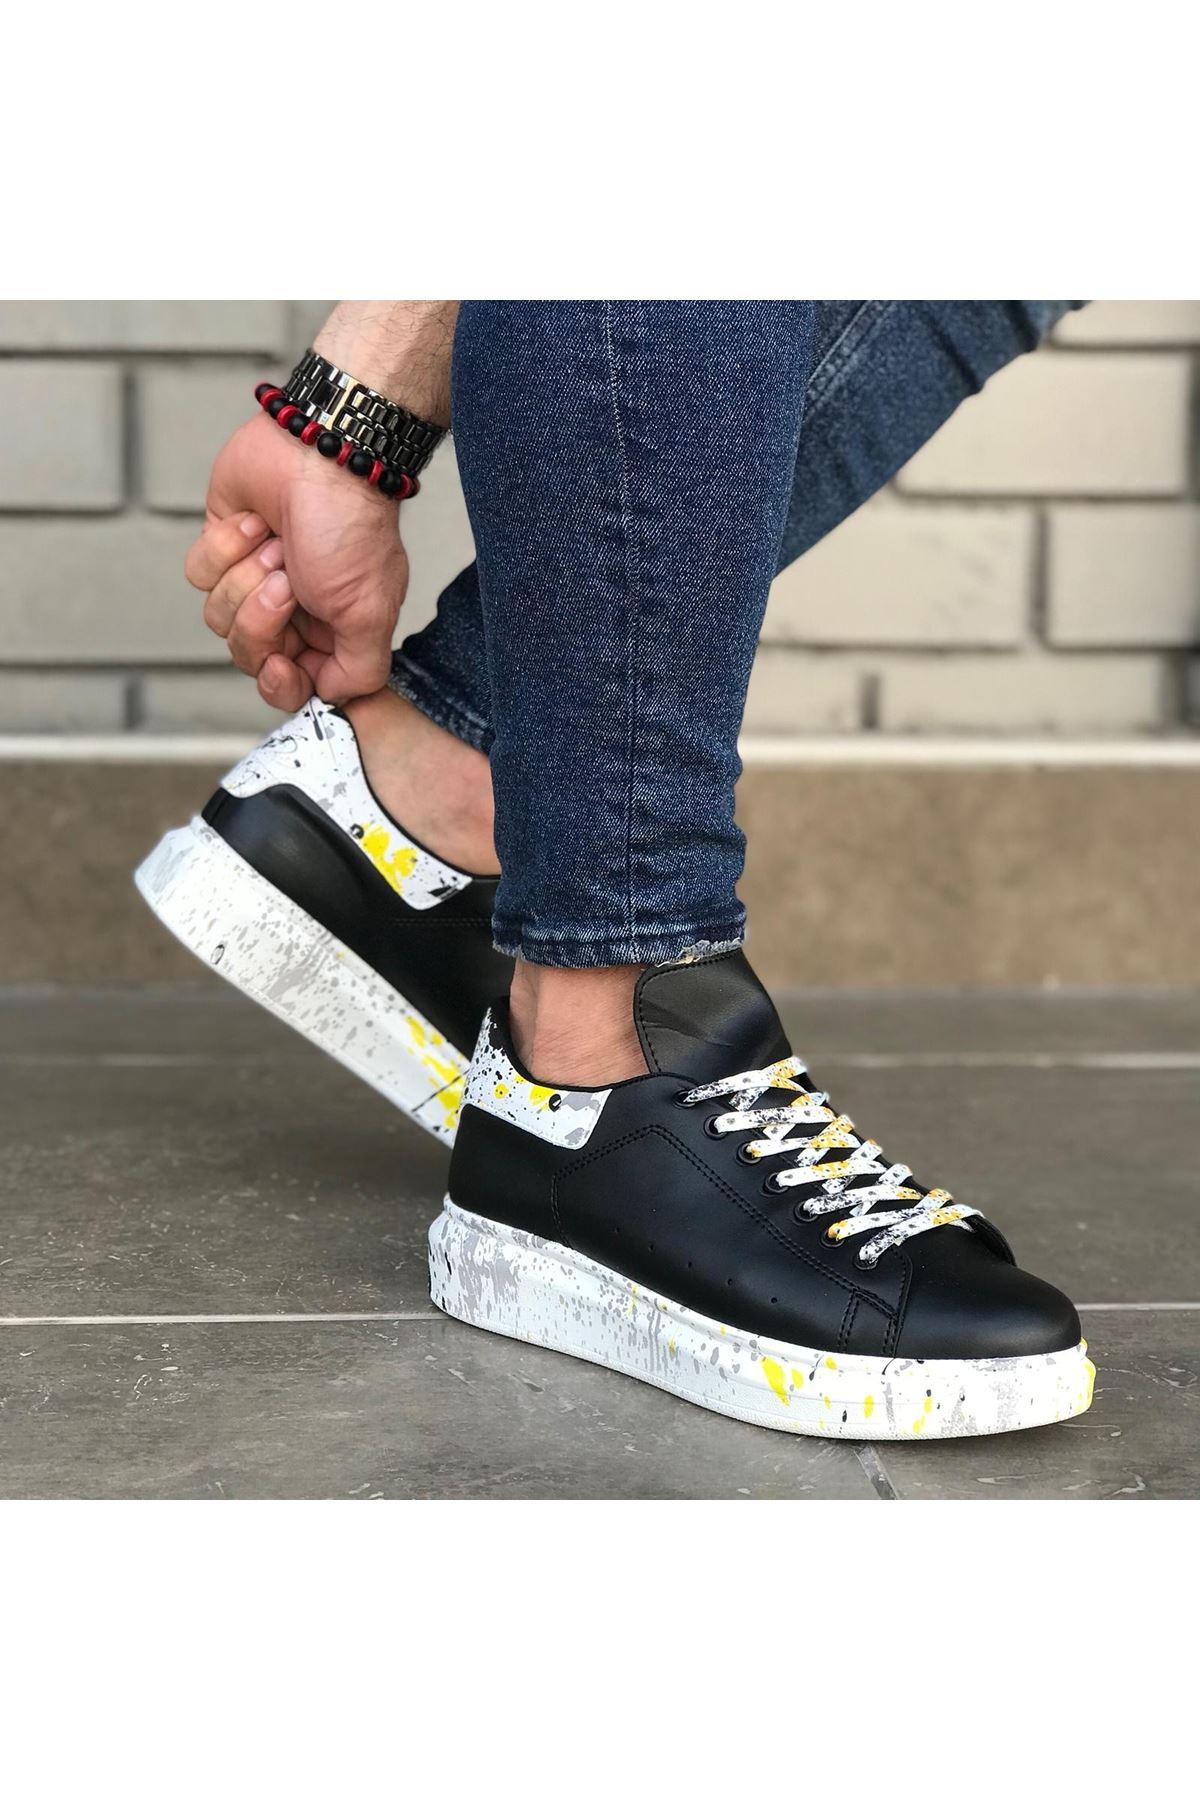 Wagoon WG501 Siyah Sarı Boyalı Erkek Casual Ayakkabı